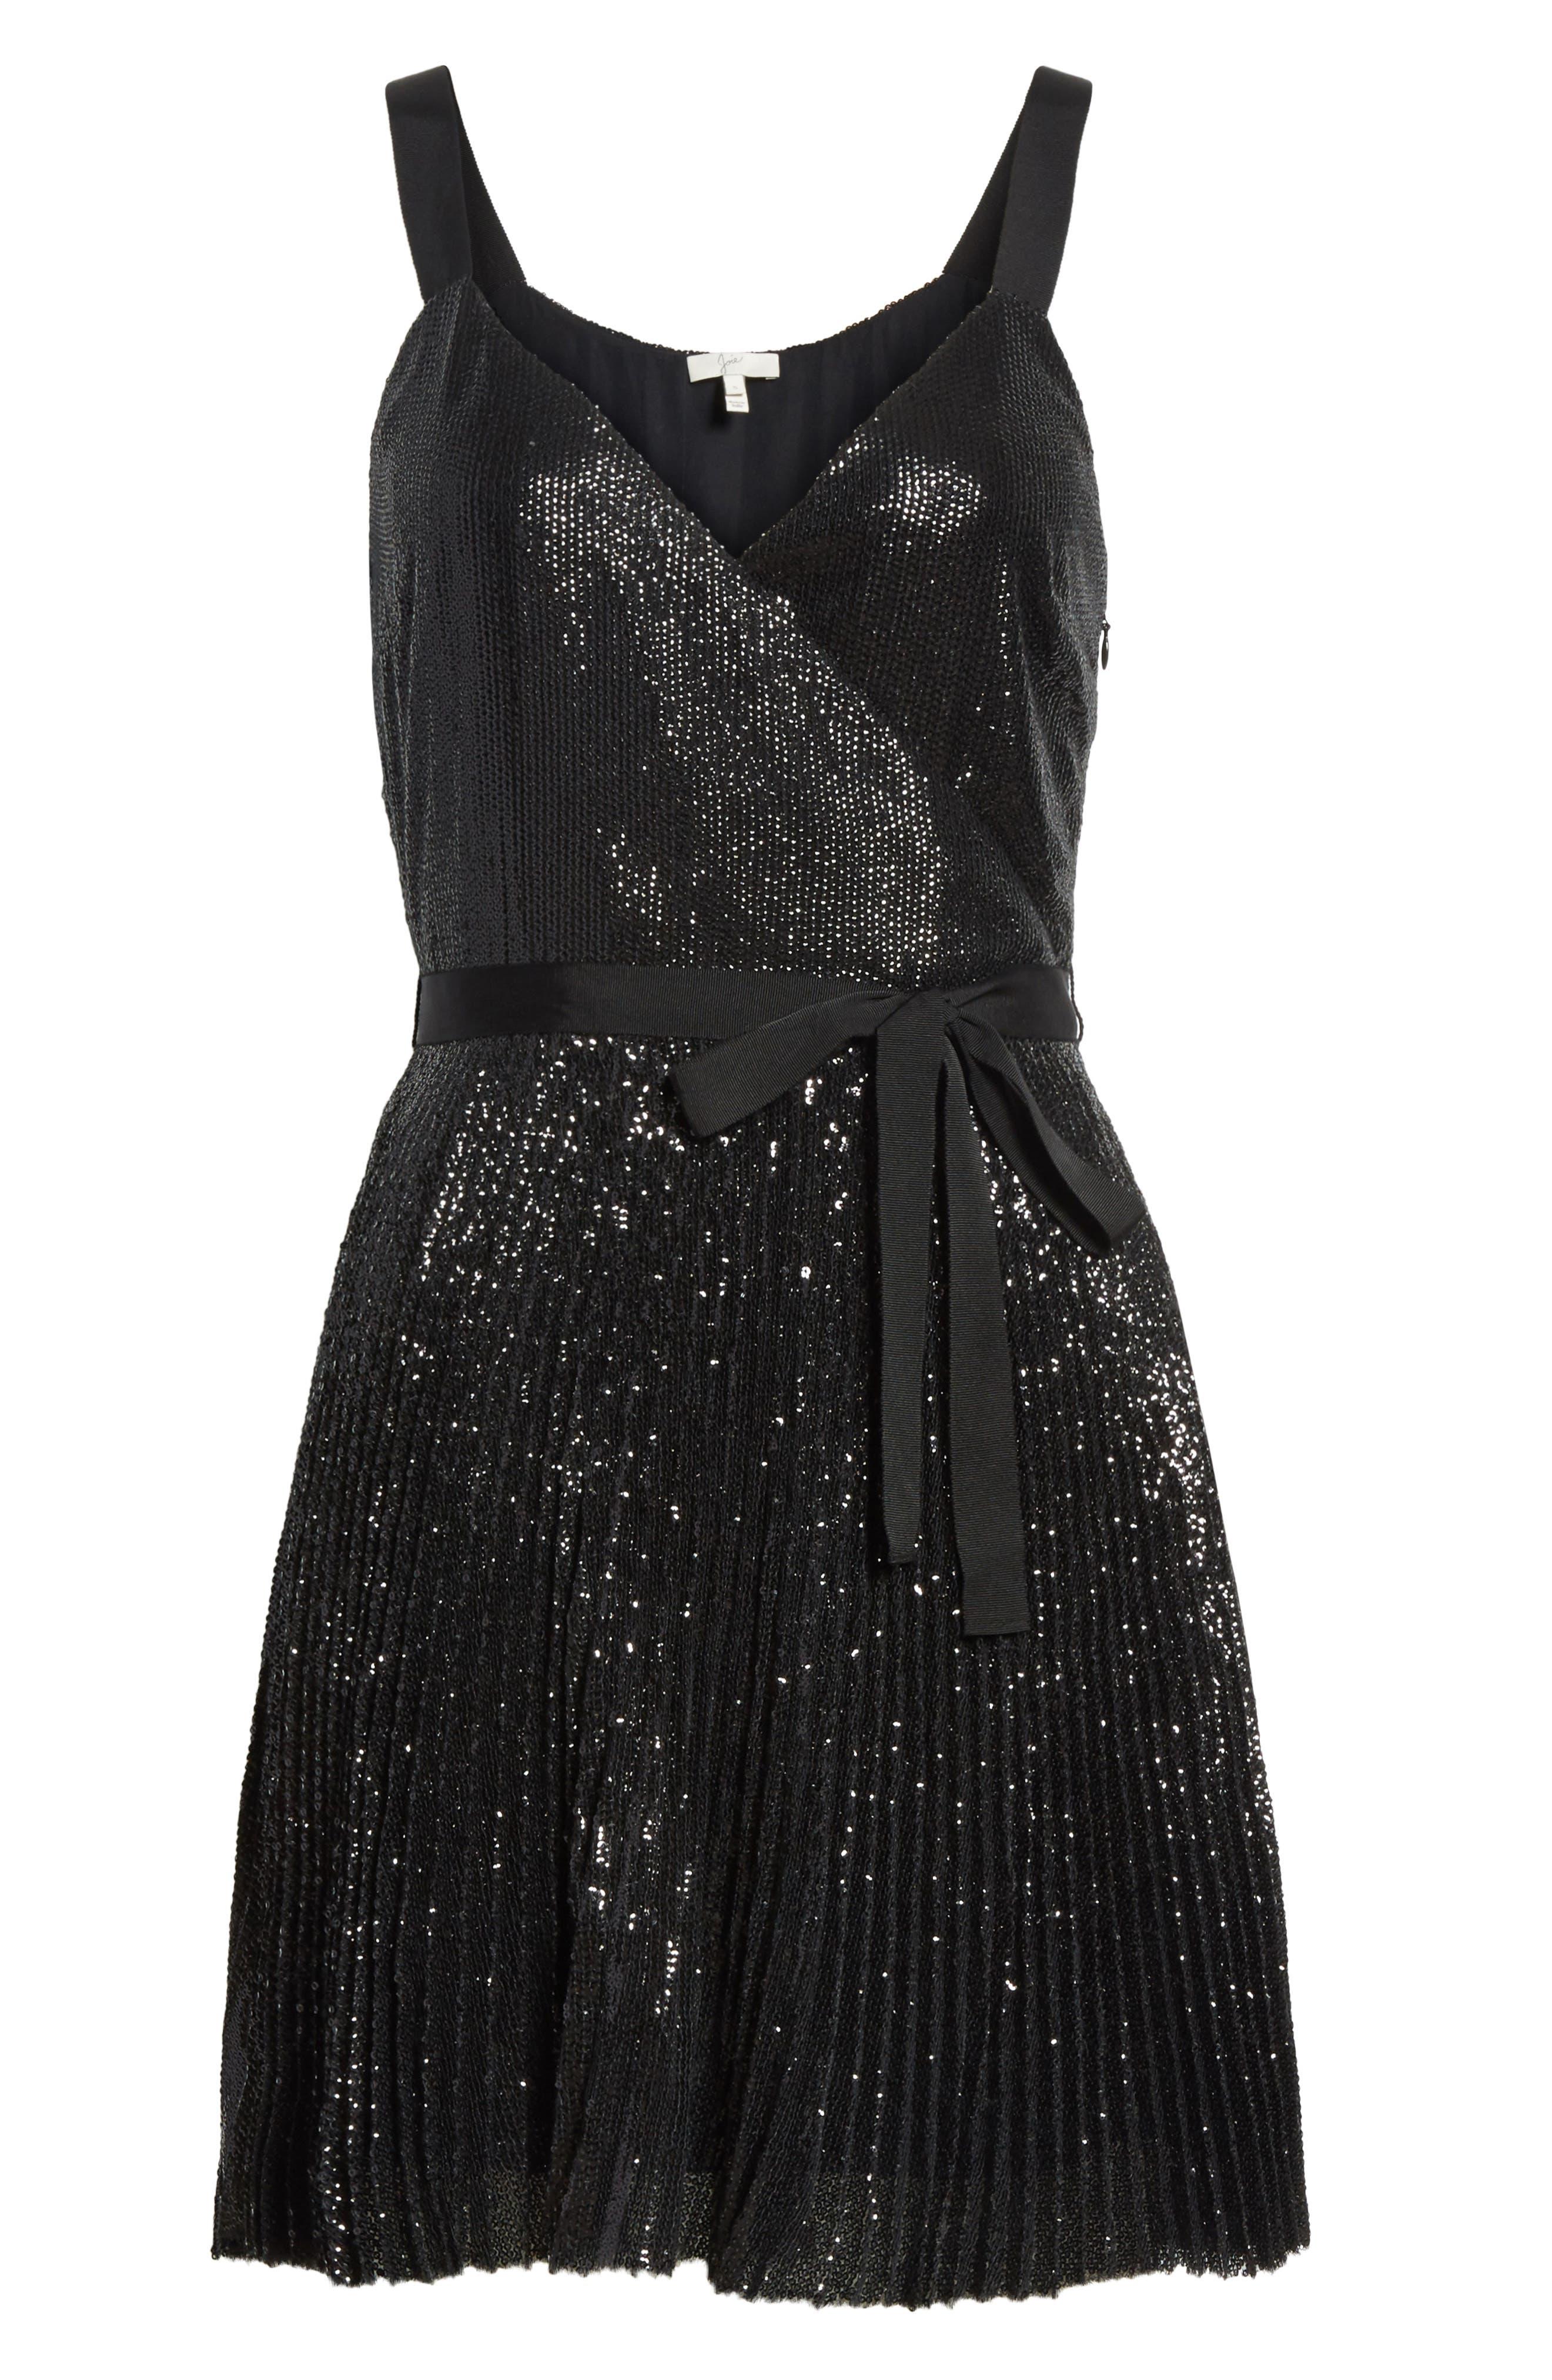 Itara Sequin Mesh Dress,                             Alternate thumbnail 6, color,